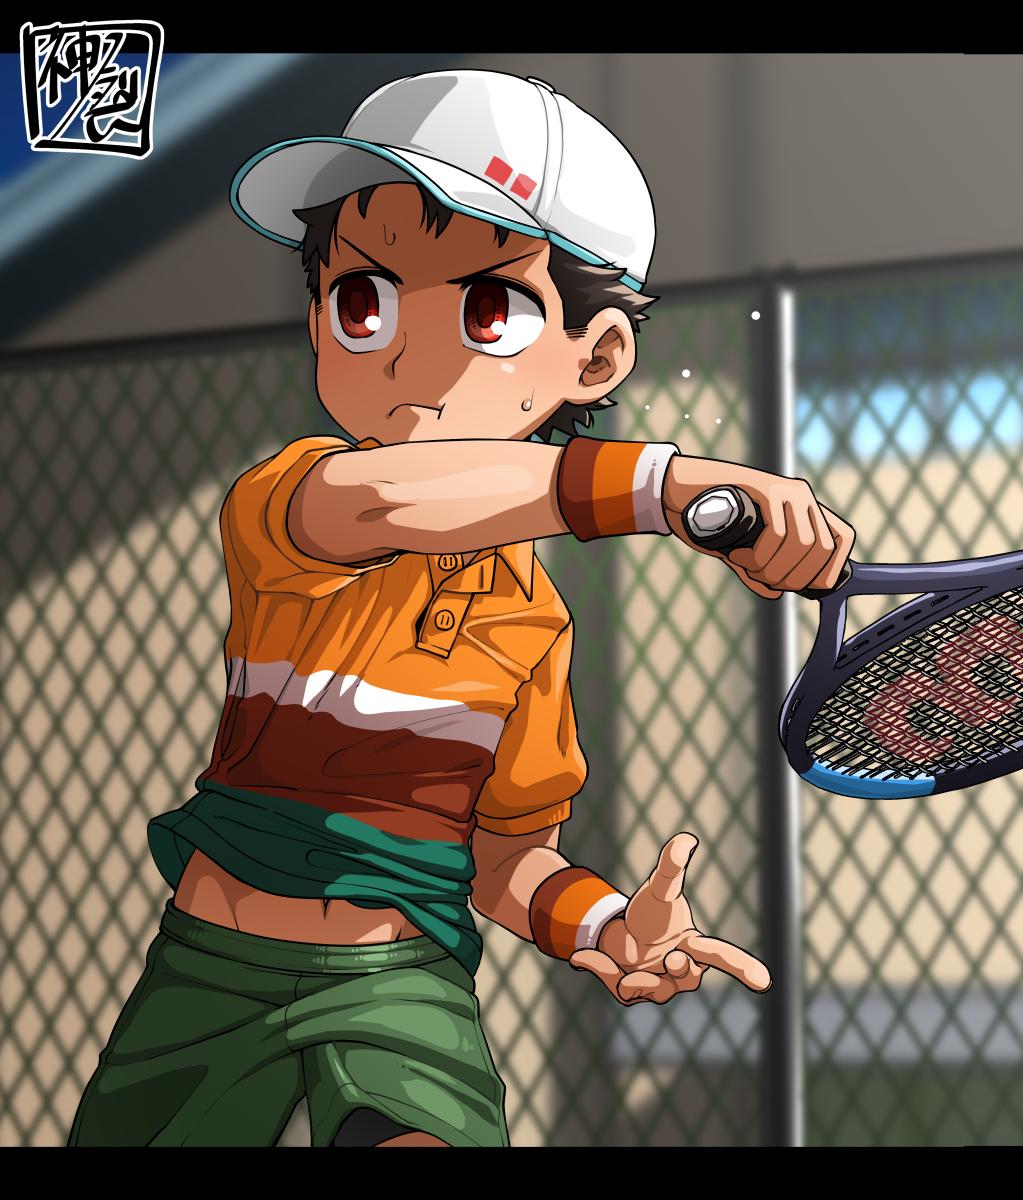 1boy belly_peek brown_hair commentary fence highres kaminosaki1 midriff navel original outdoors red_eyes shoes shorts sneakers sportswear sweatdrop tennis tennis_court tennis_uniform